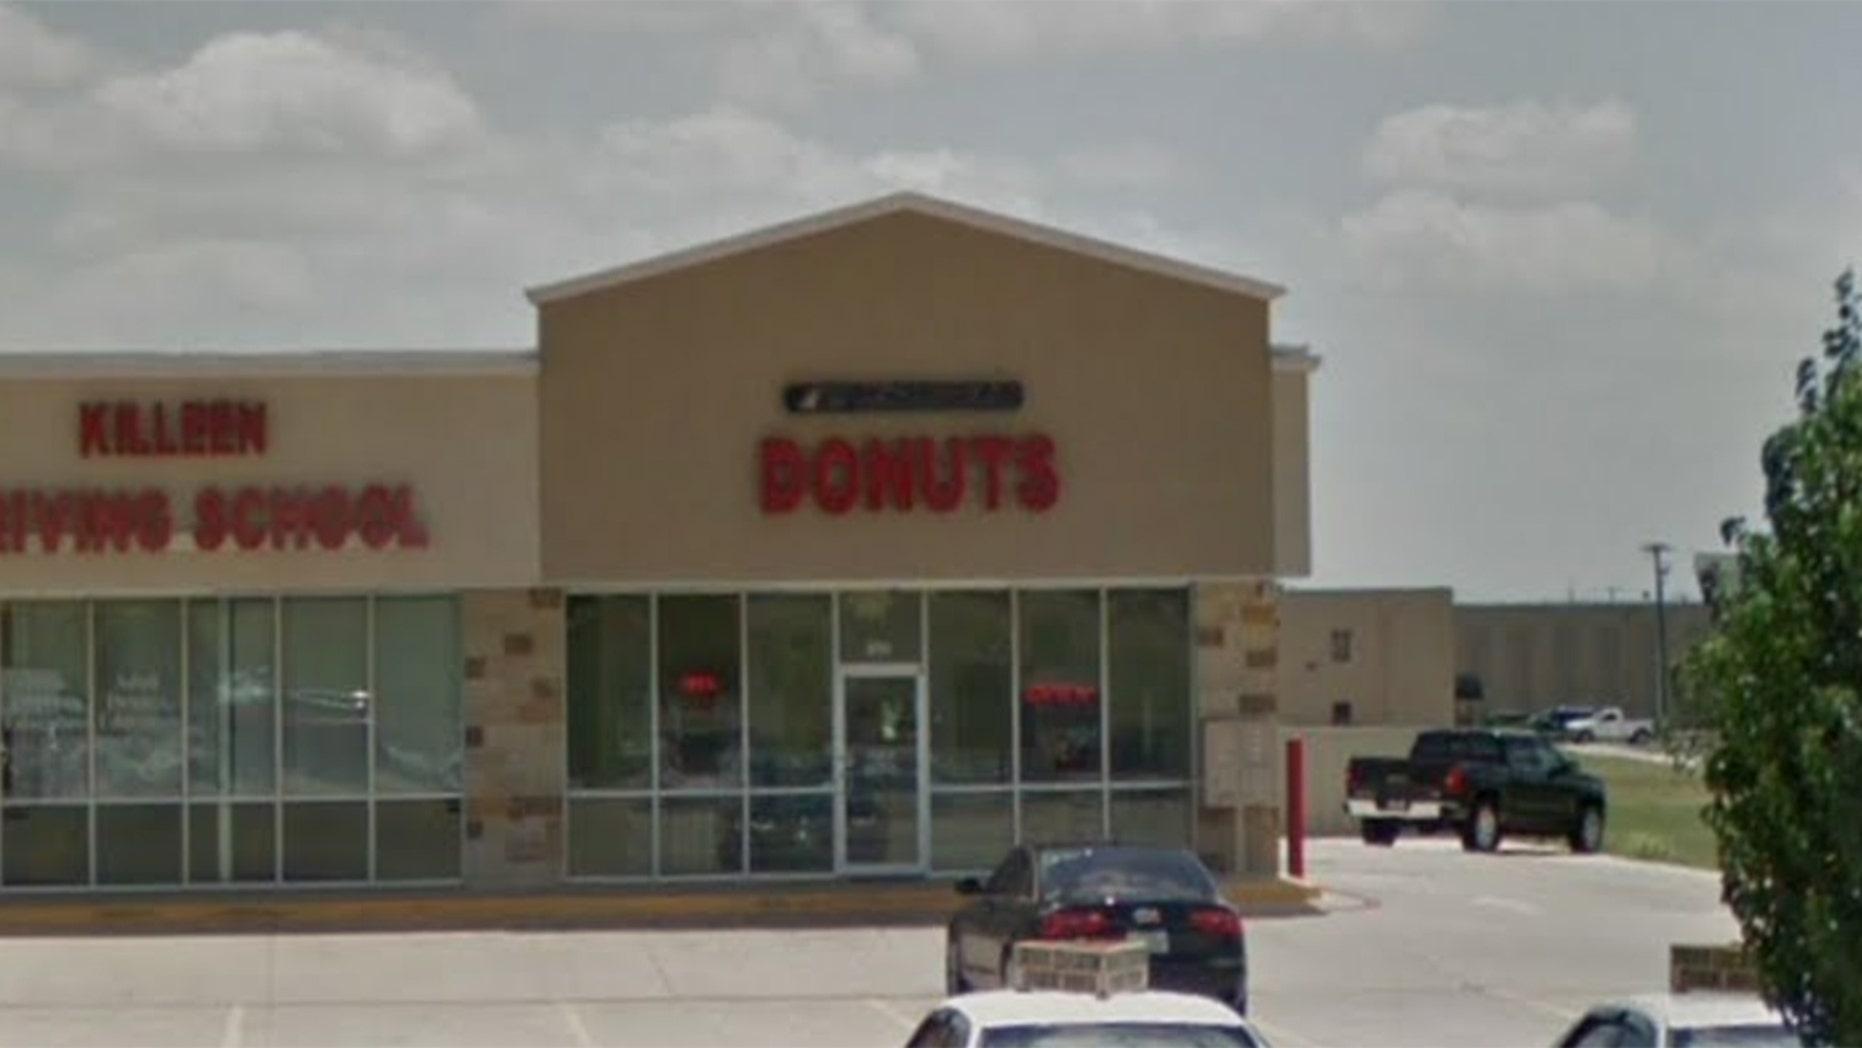 Best Donuts in Killeen, Texas